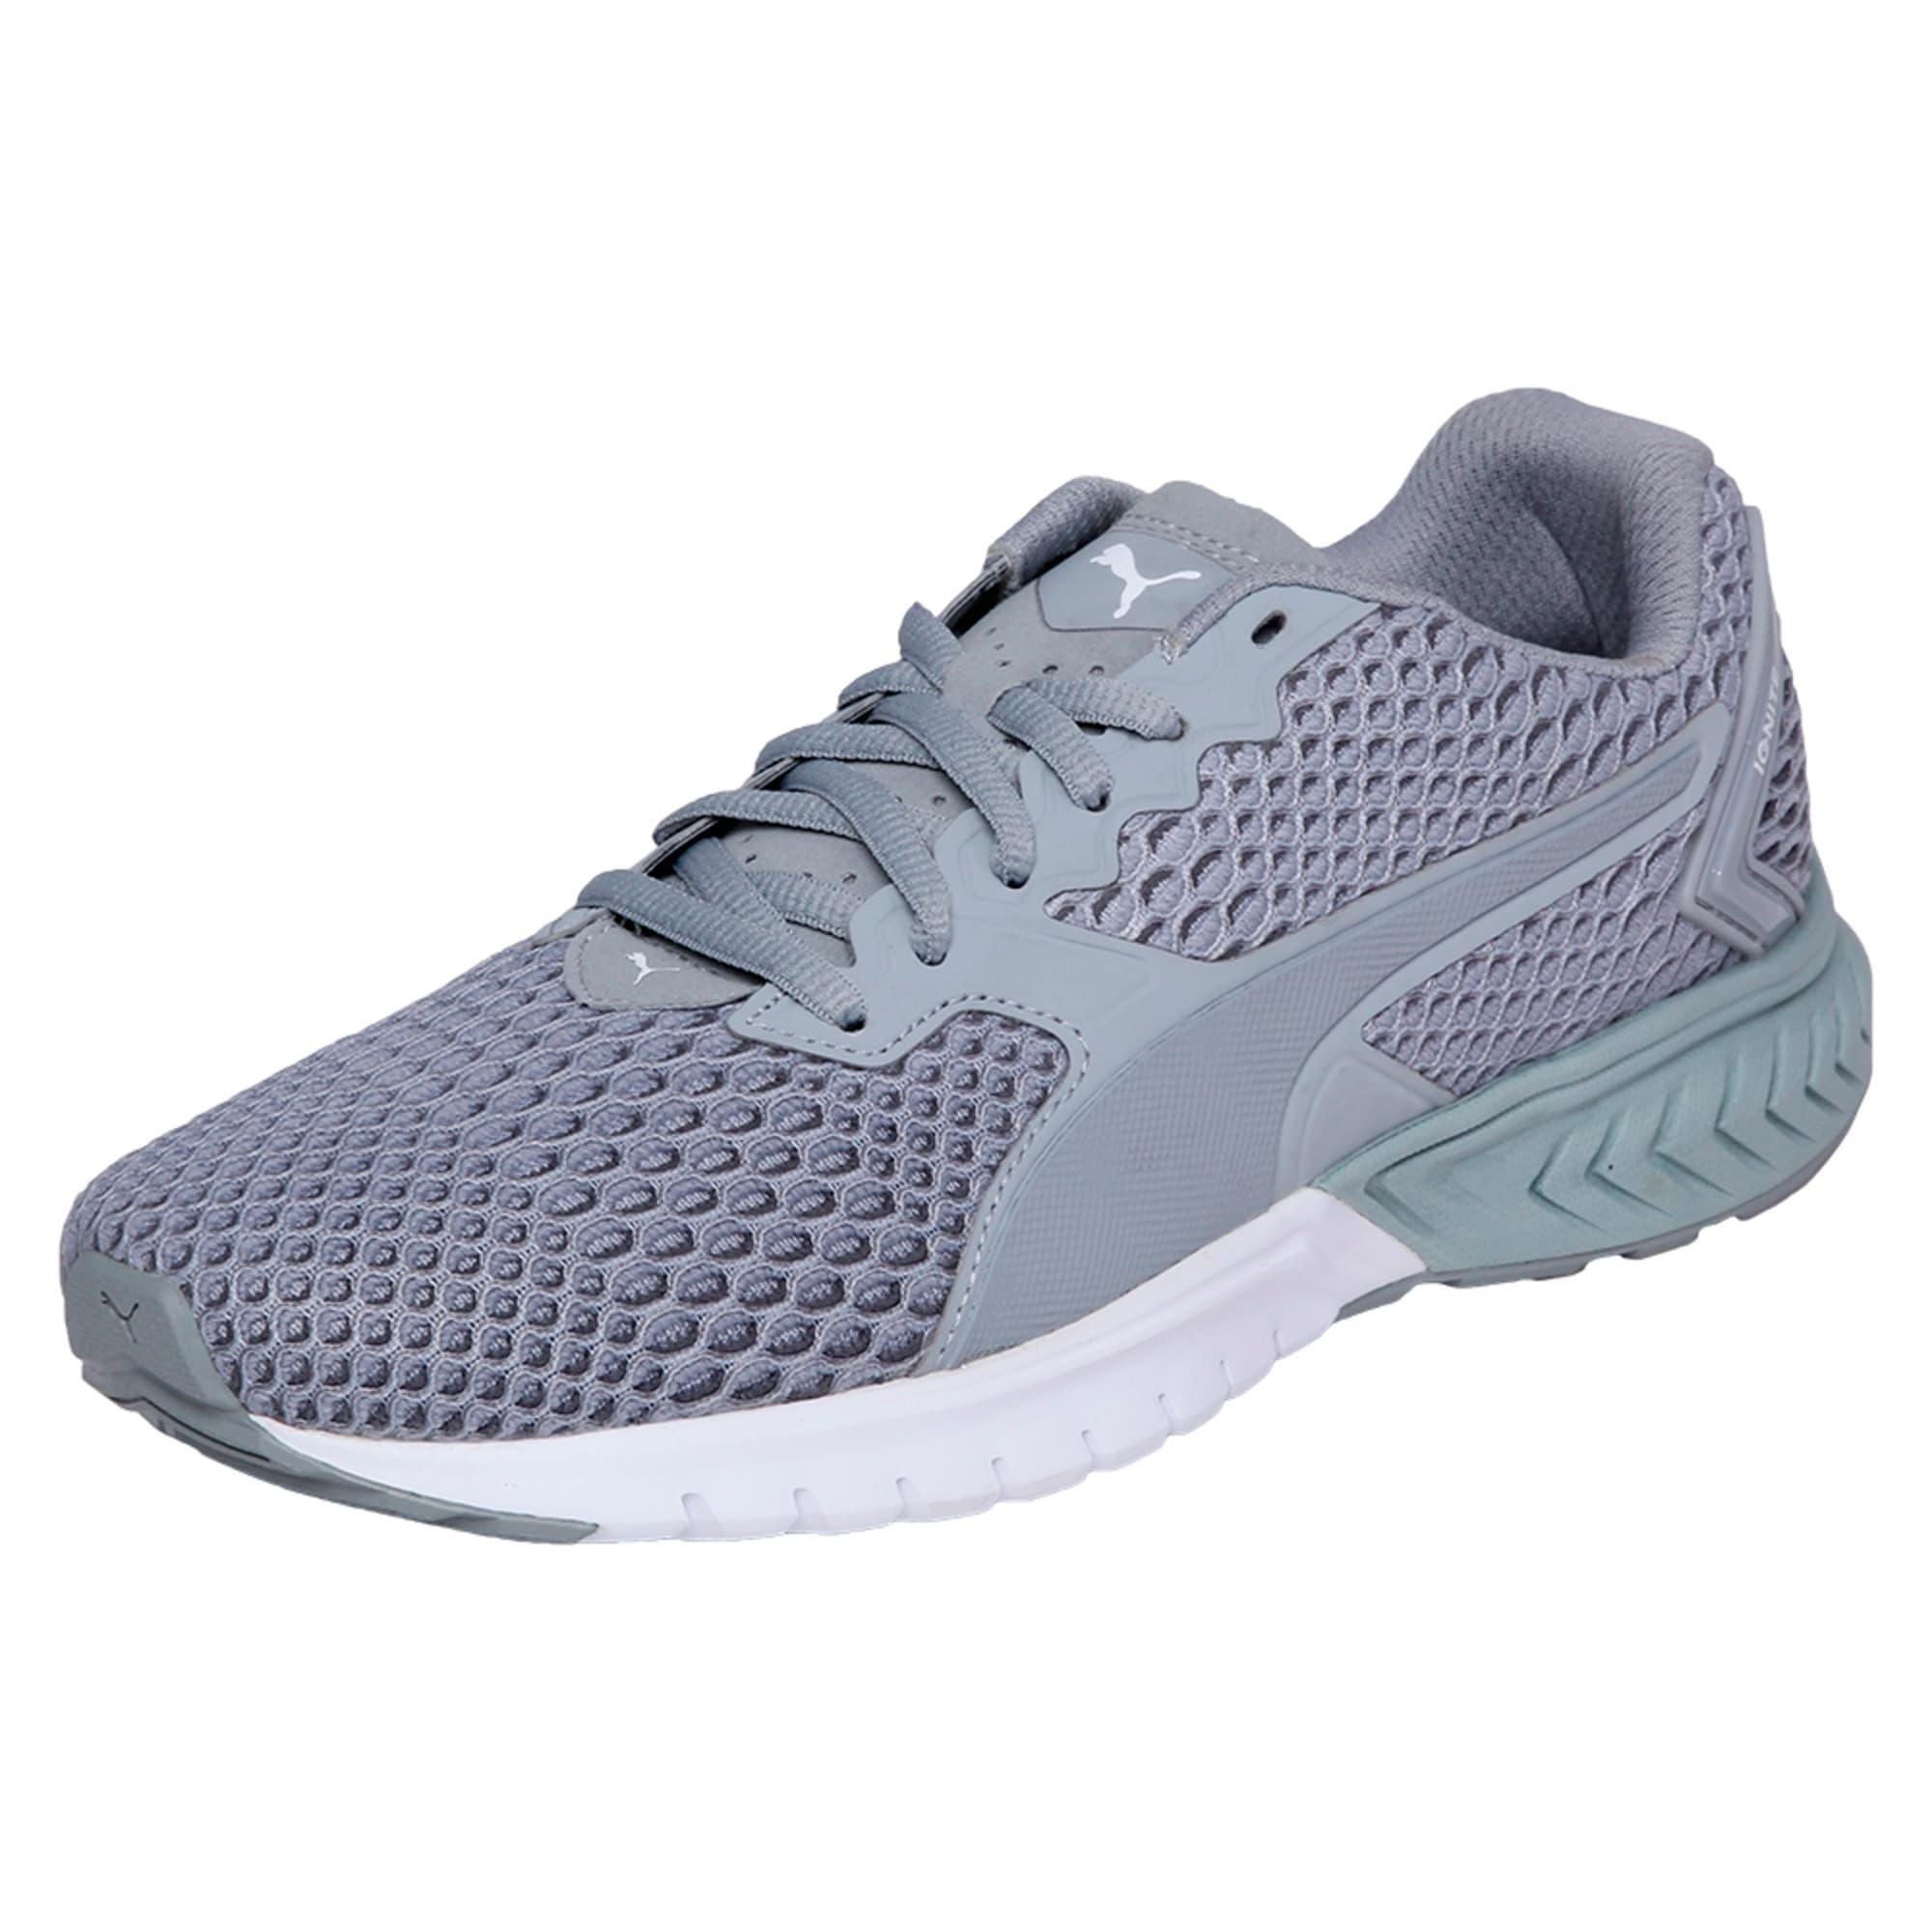 Thumbnail 1 of IGNITE Dual New Core Women's Training Shoes, Quarry-QUIET SHADE, medium-IND